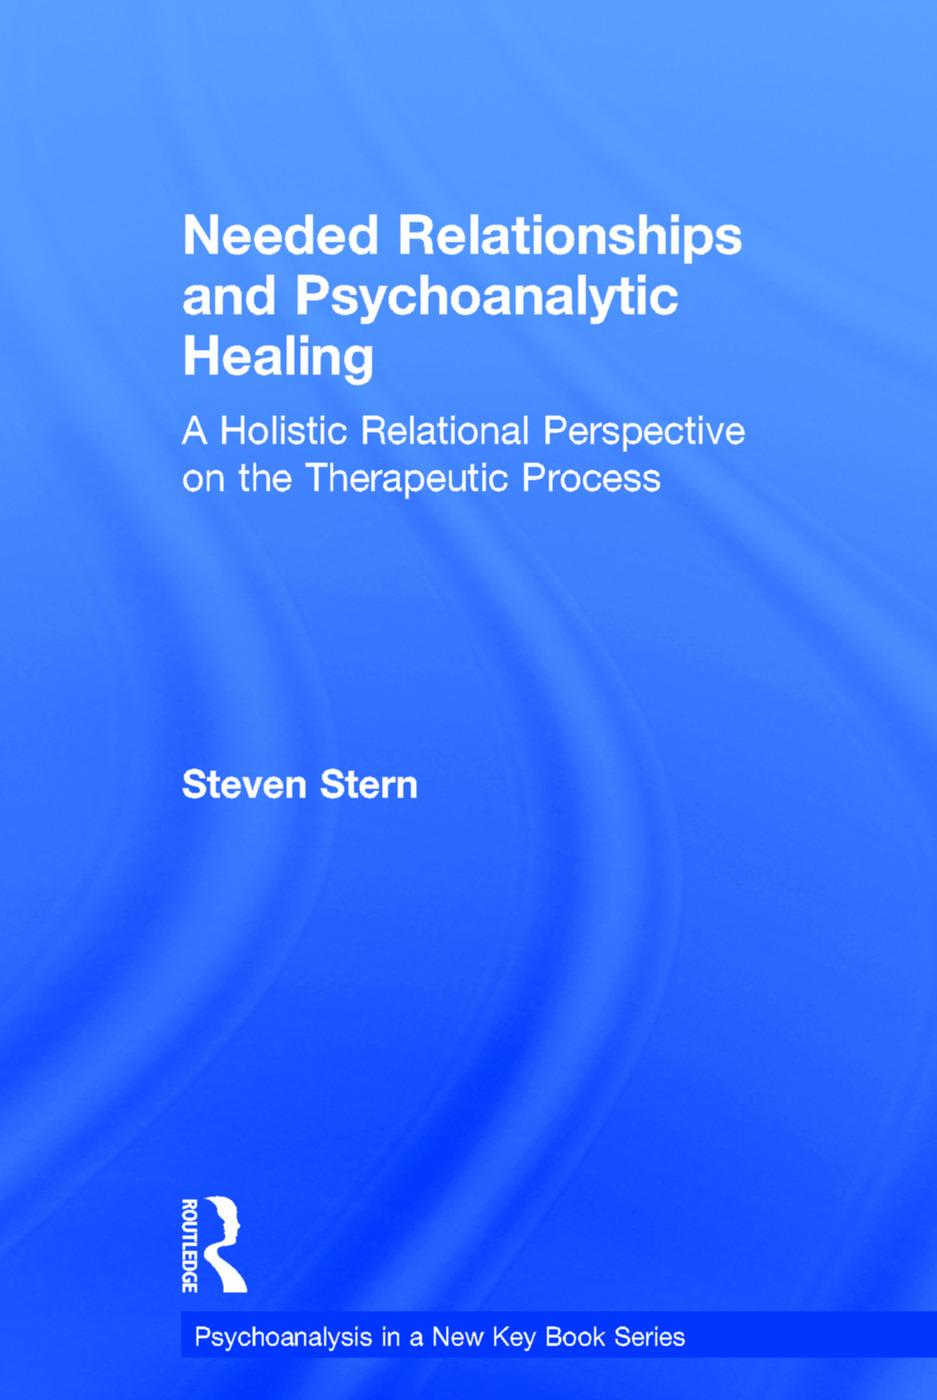 Needed Relationships and Psychoanalytic Healing